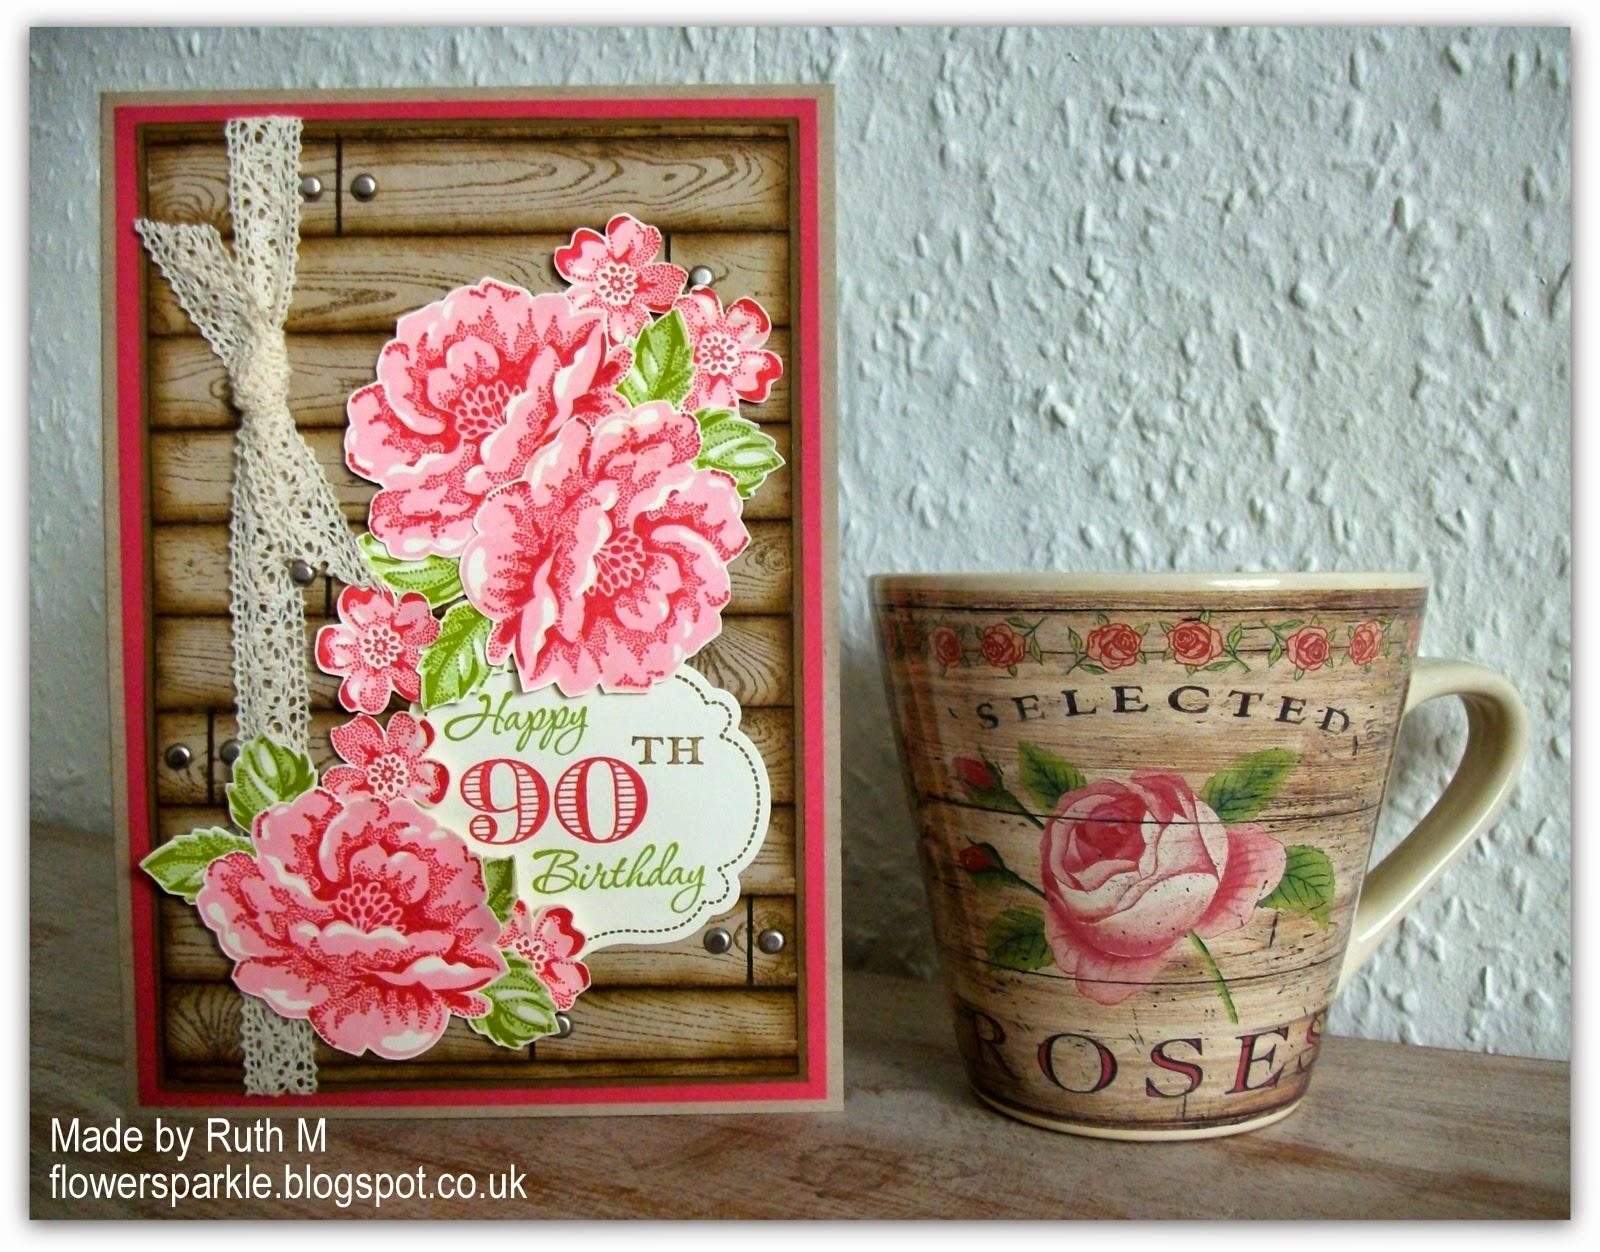 Flower Sparkle Wooden Planks Roses 90th Birthday Card